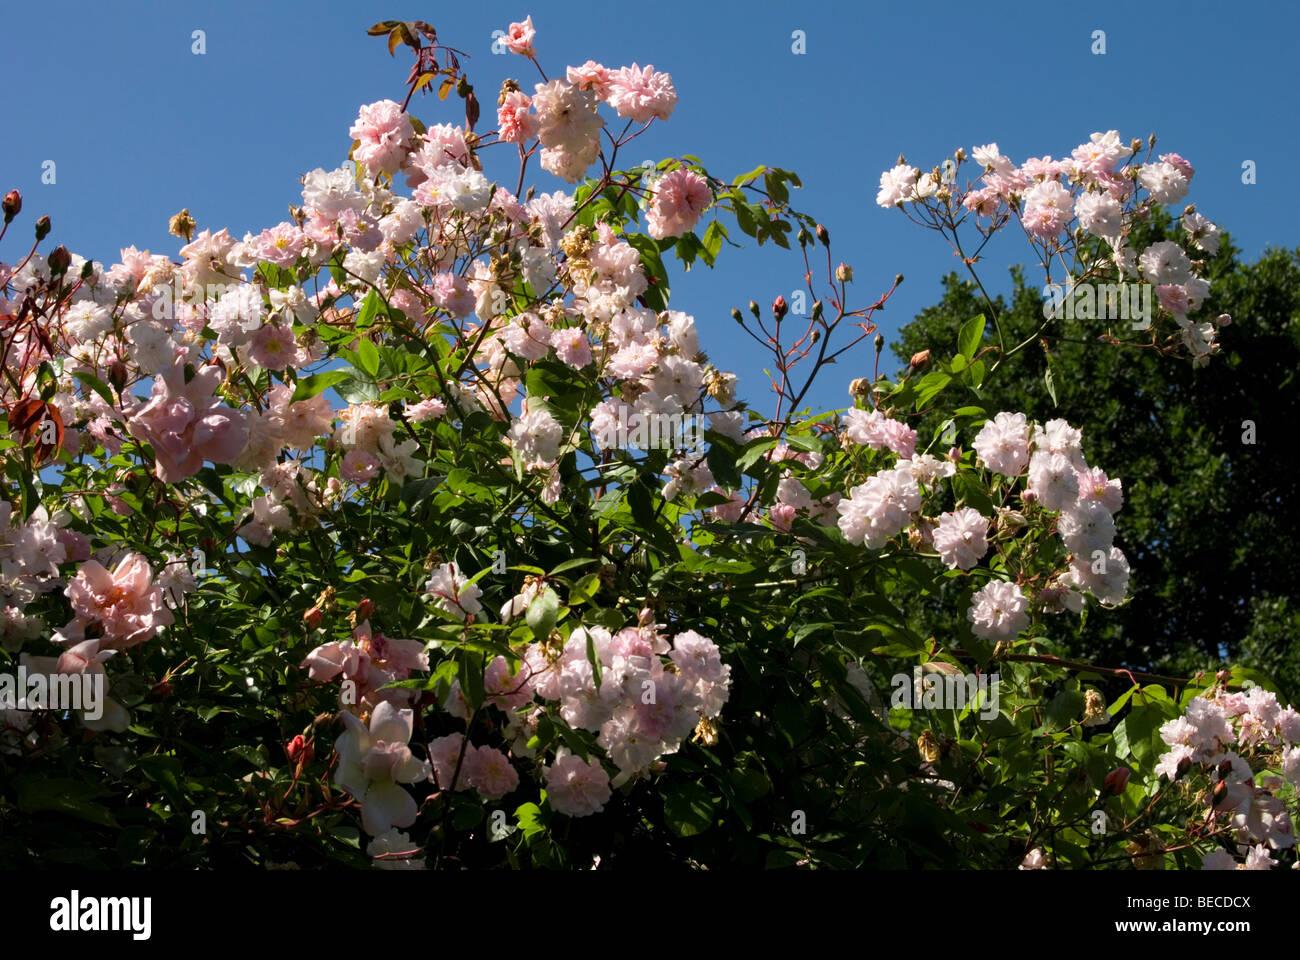 Rosa 'Paul's Himalayan Musk Rambler' - Stock Image